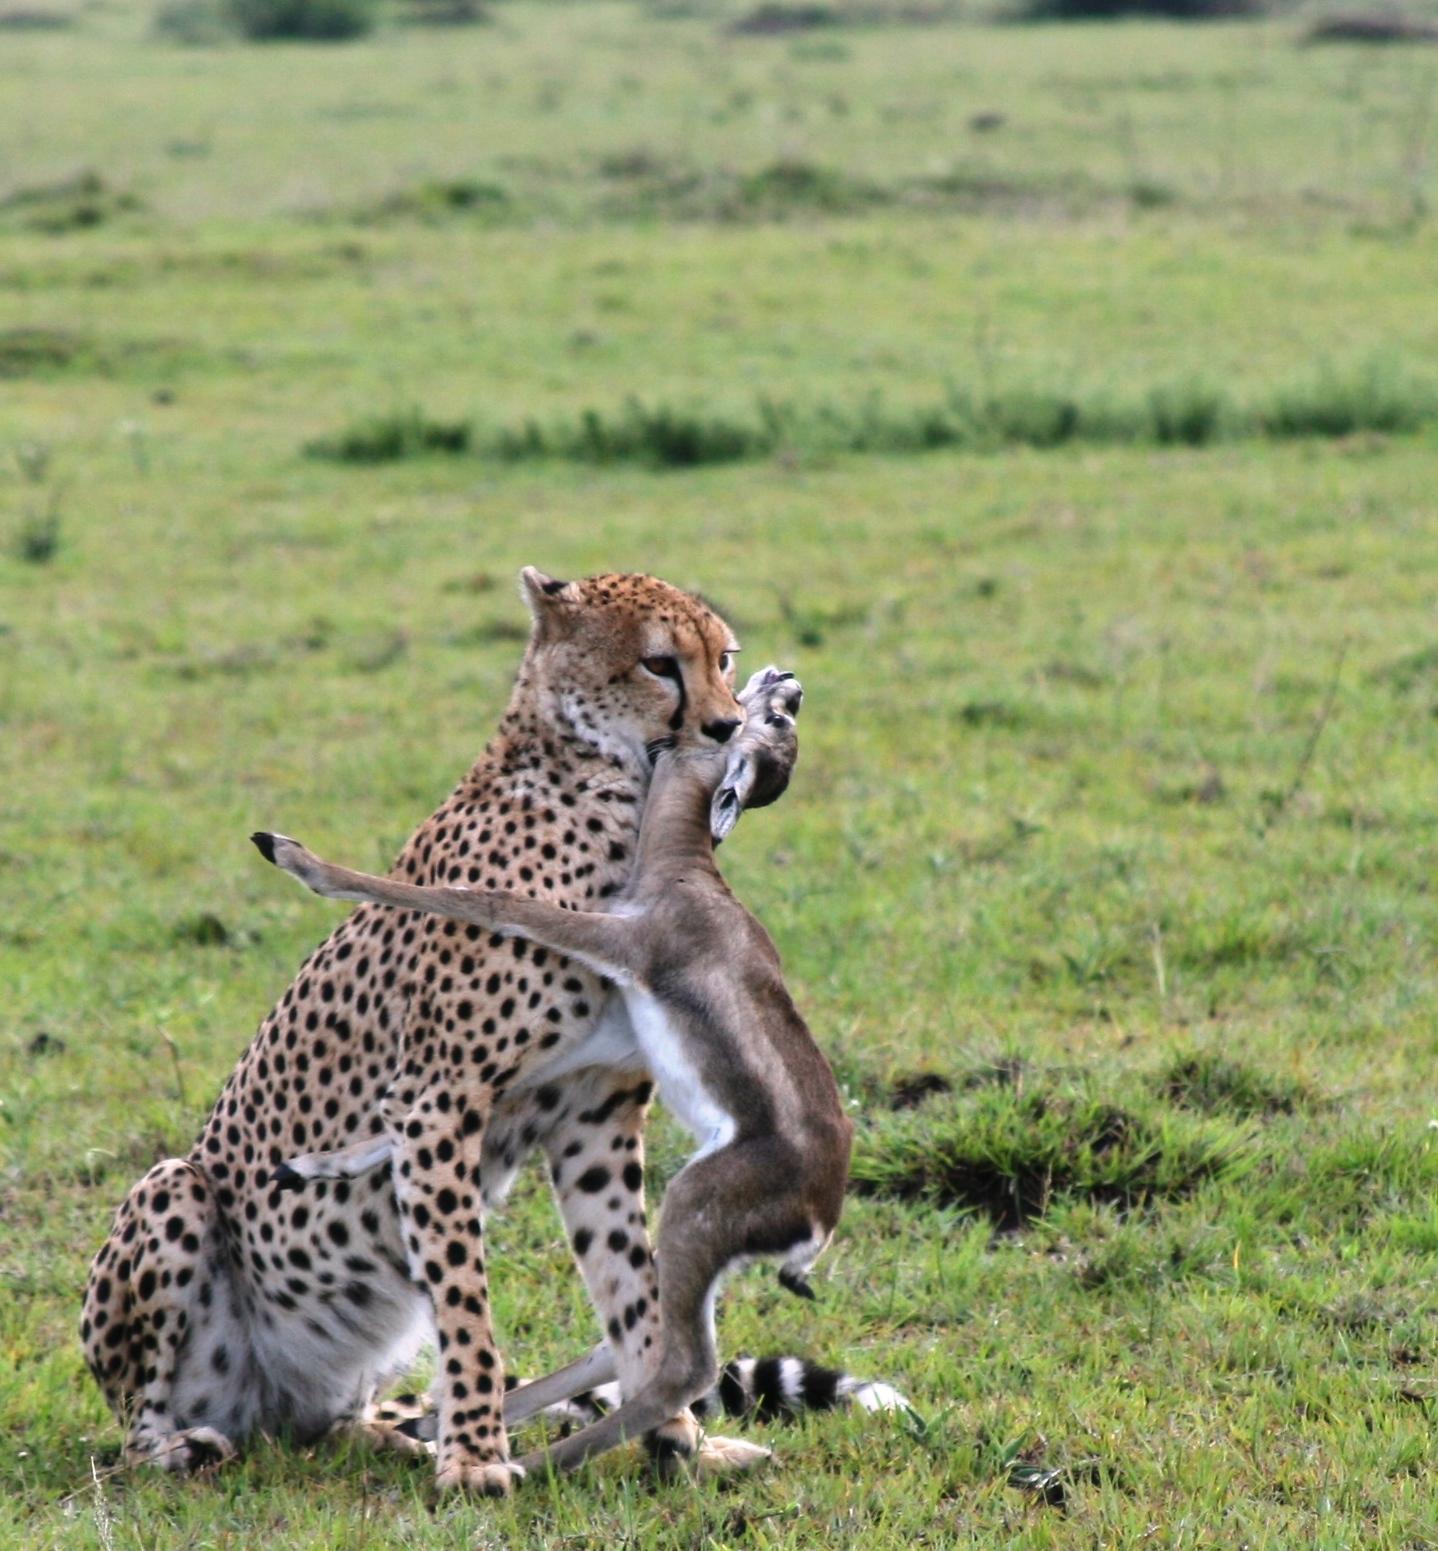 Cheetah Catching Prey